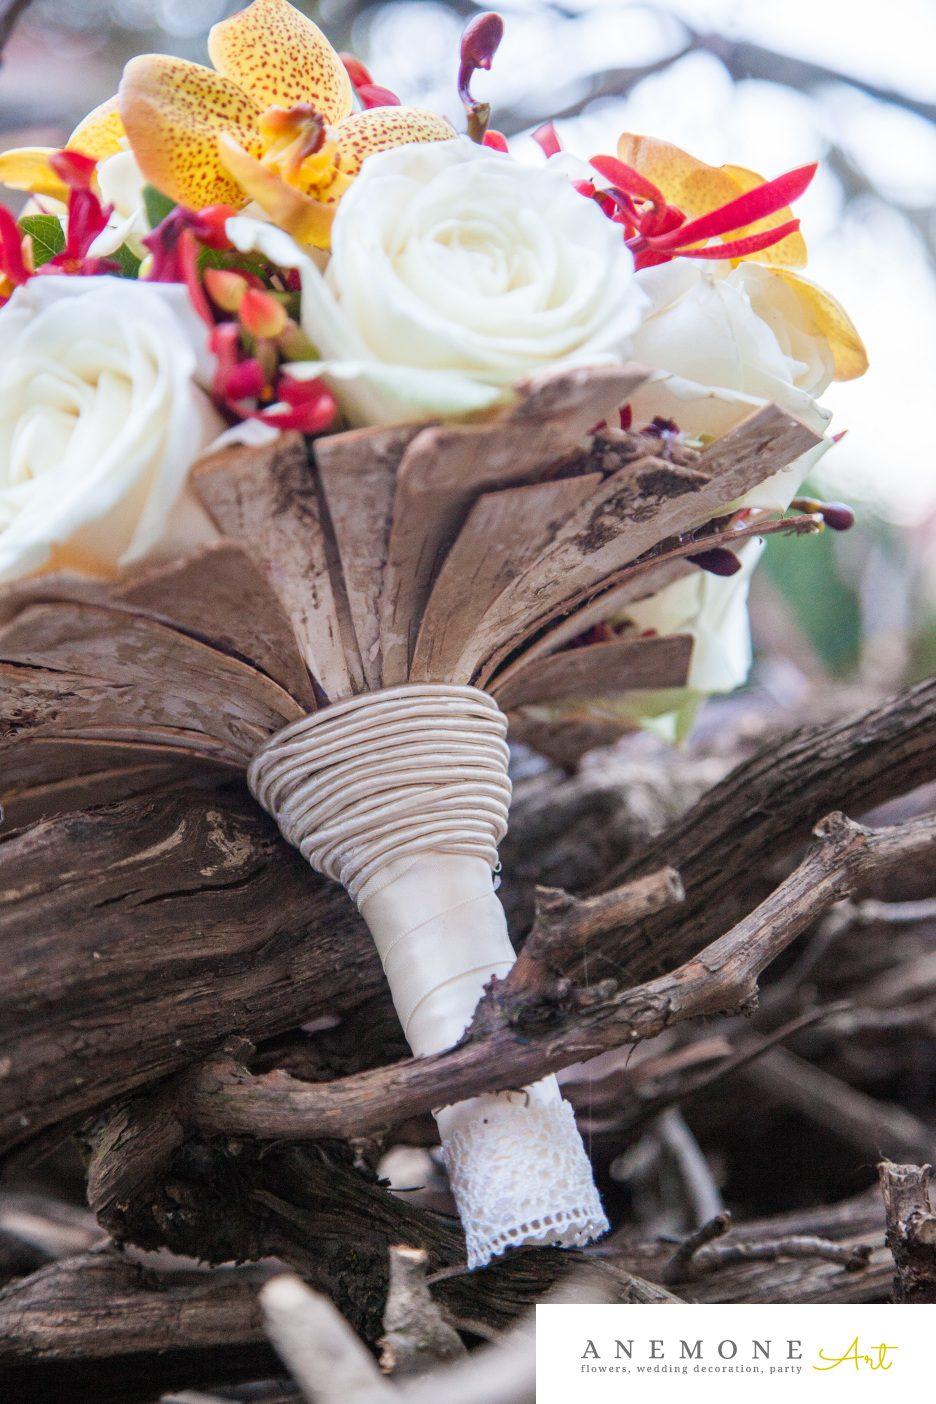 Poza, foto cu Flori de nunta buchet mireasa, caramiziu, galben, maner buchet, vanda in Arad, Timisoara, Oradea (wedding flowers, bouquets) nunta Arad, Timisoara, Oradea